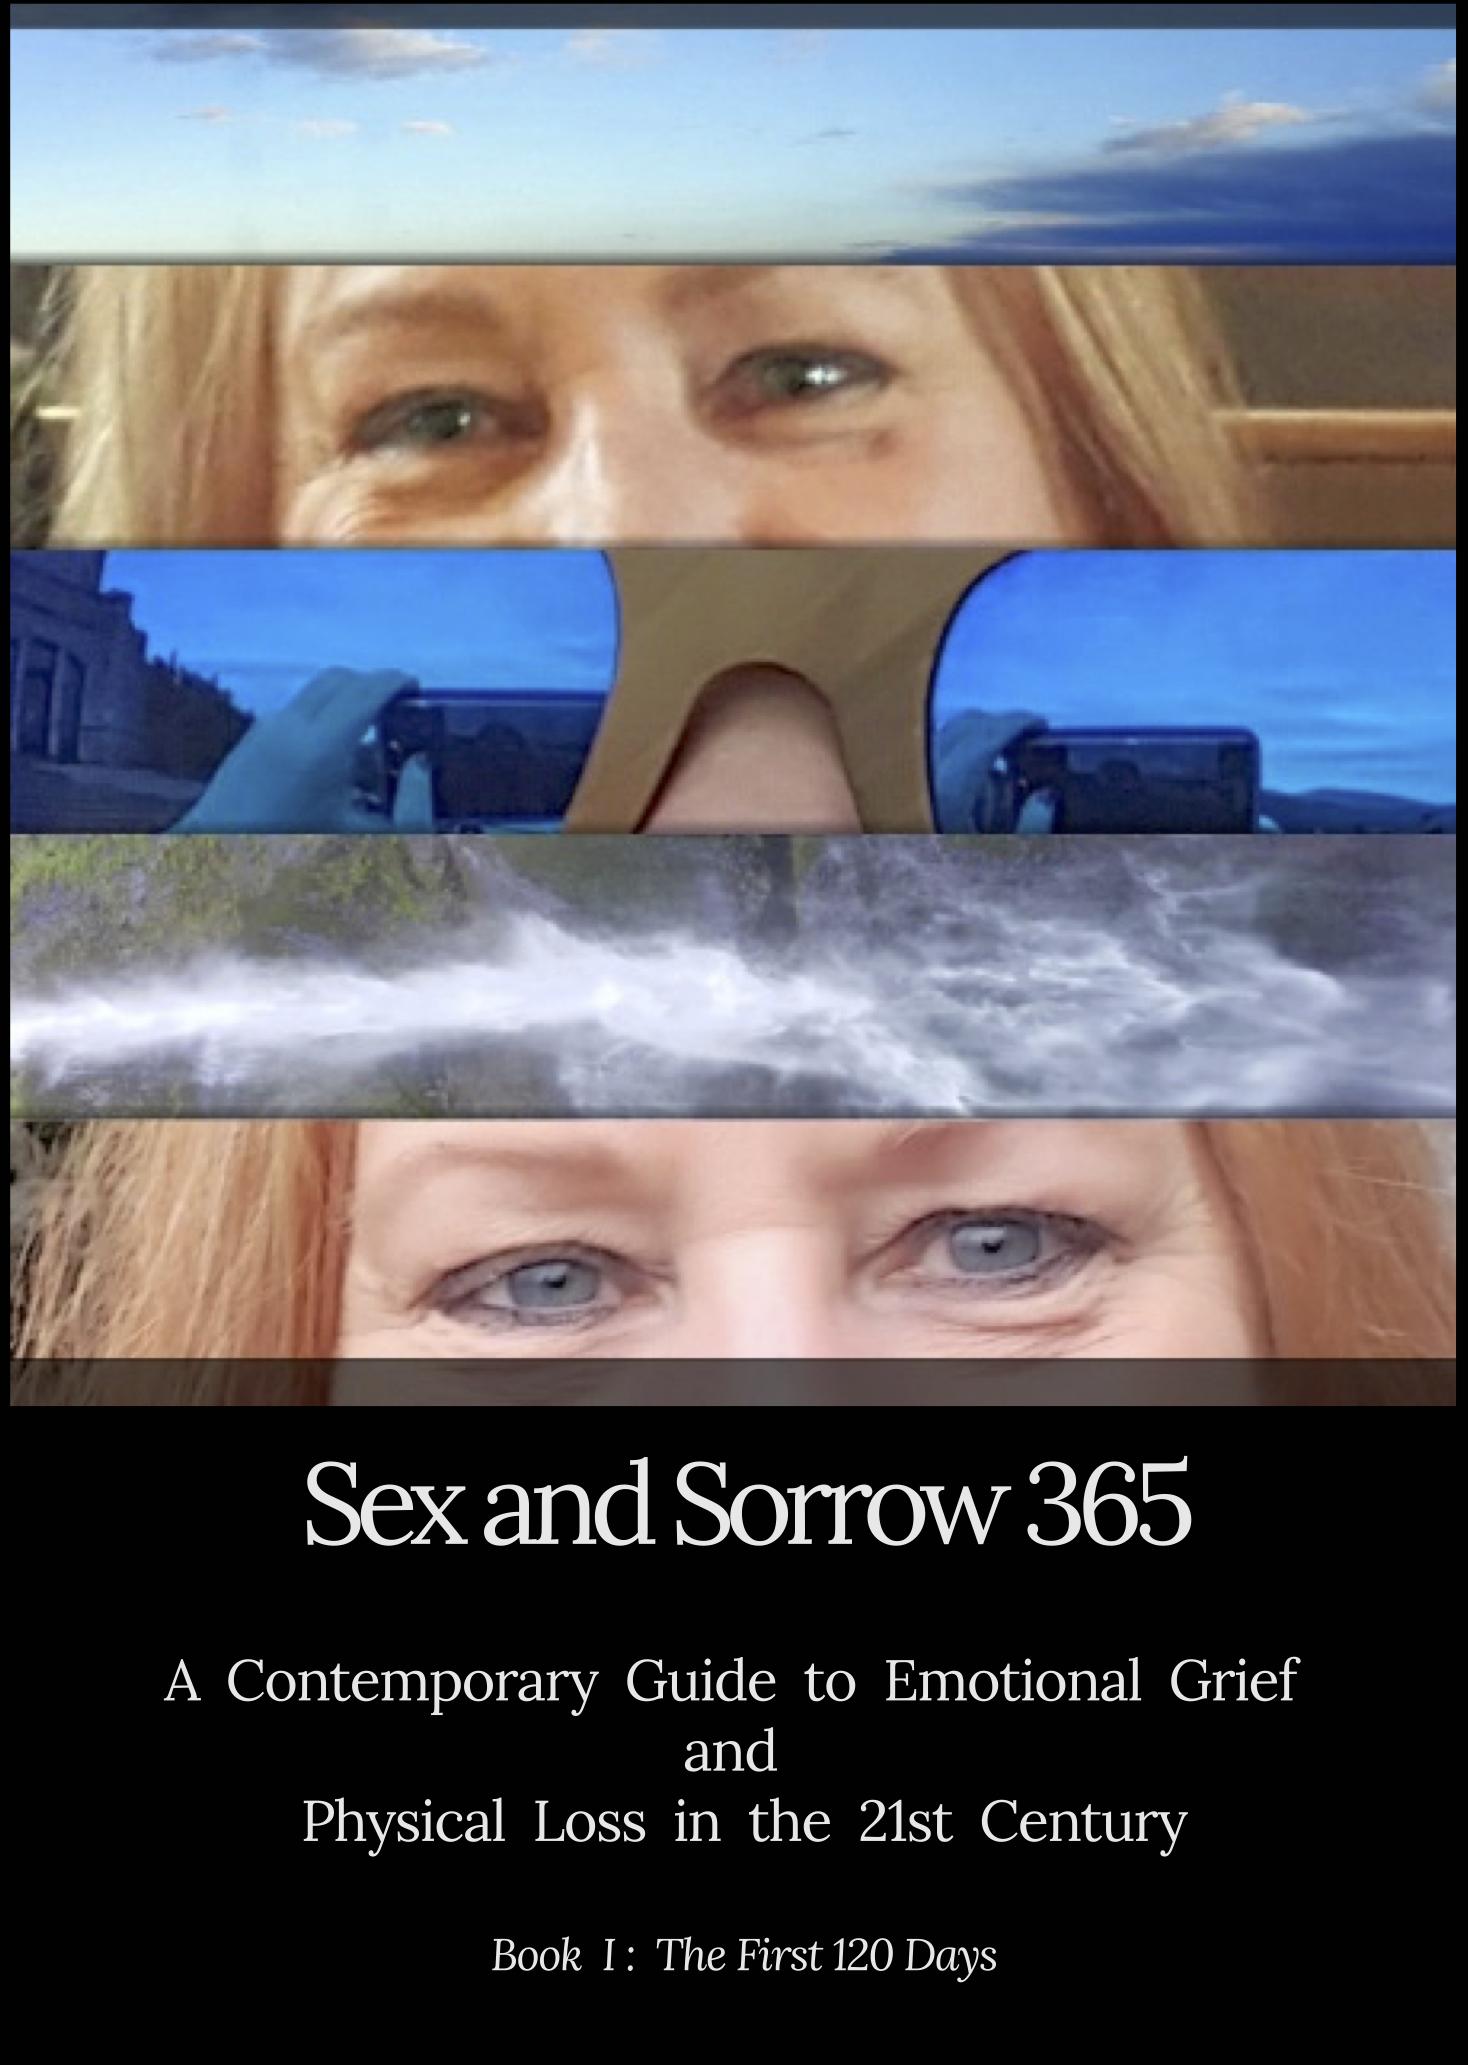 Drake Book Cover Sex and Sorrow.jpg